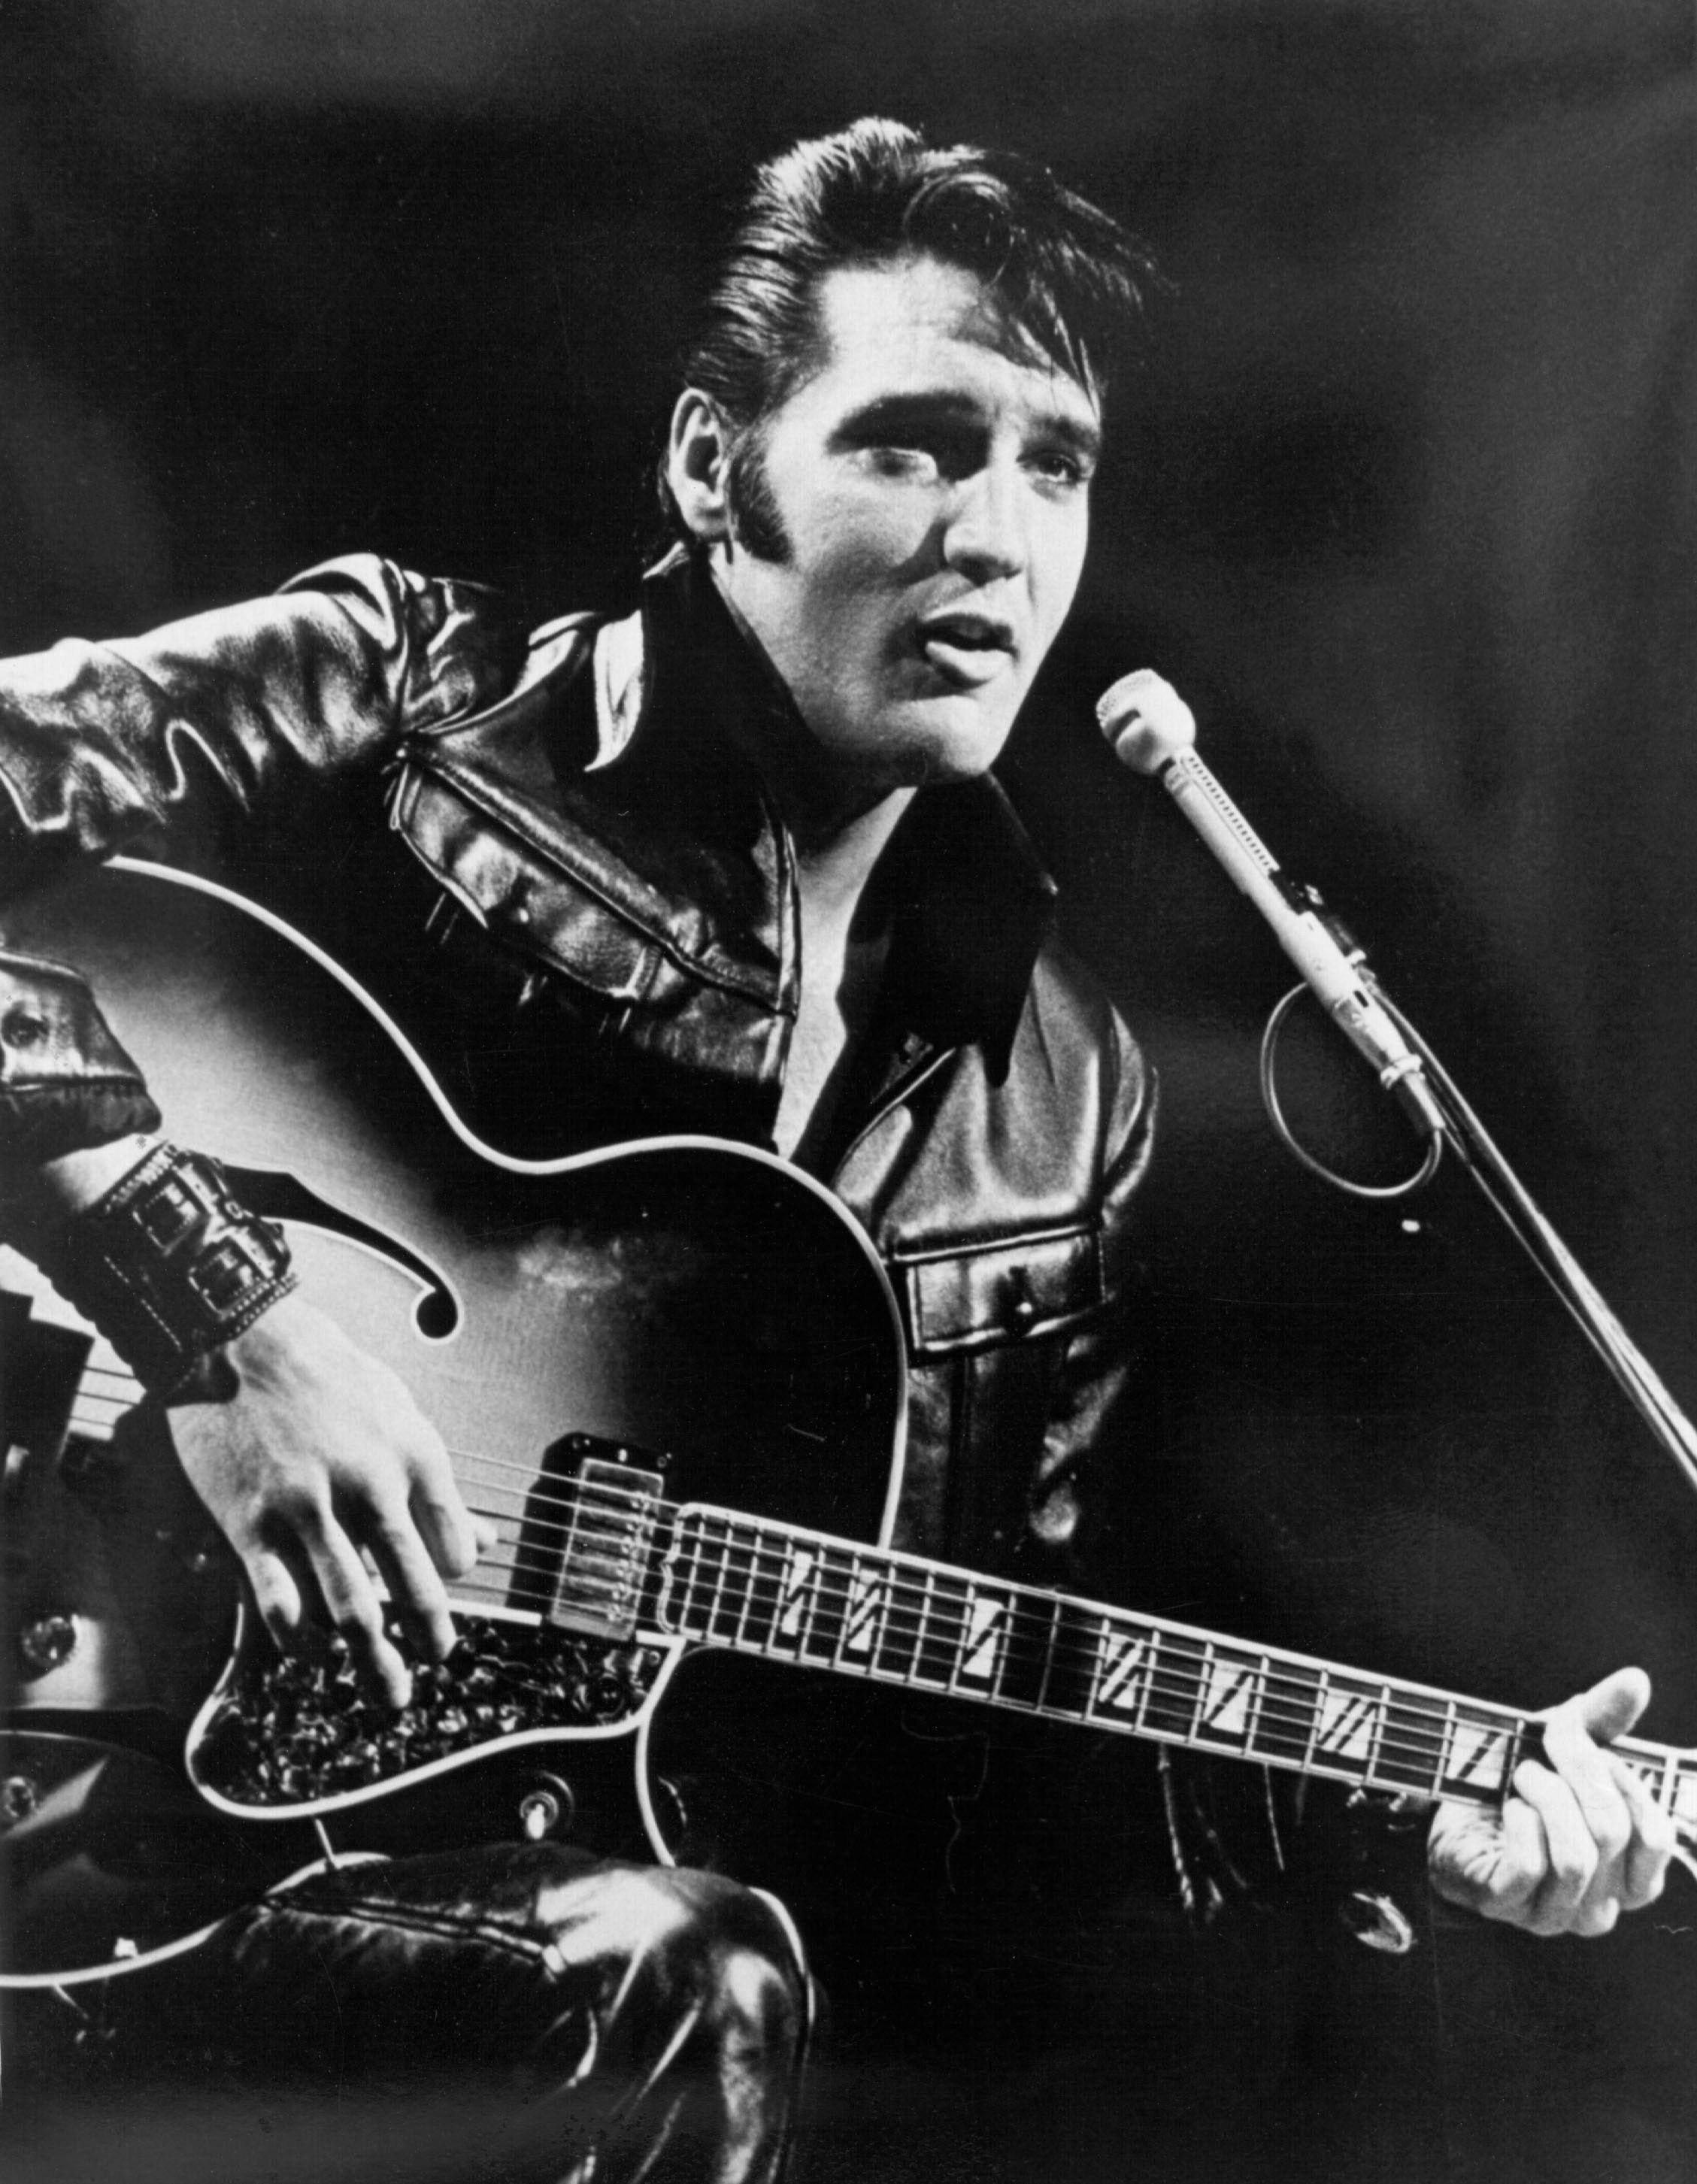 Elvis Presley Wallpapers Iphone Wallpaper Cave